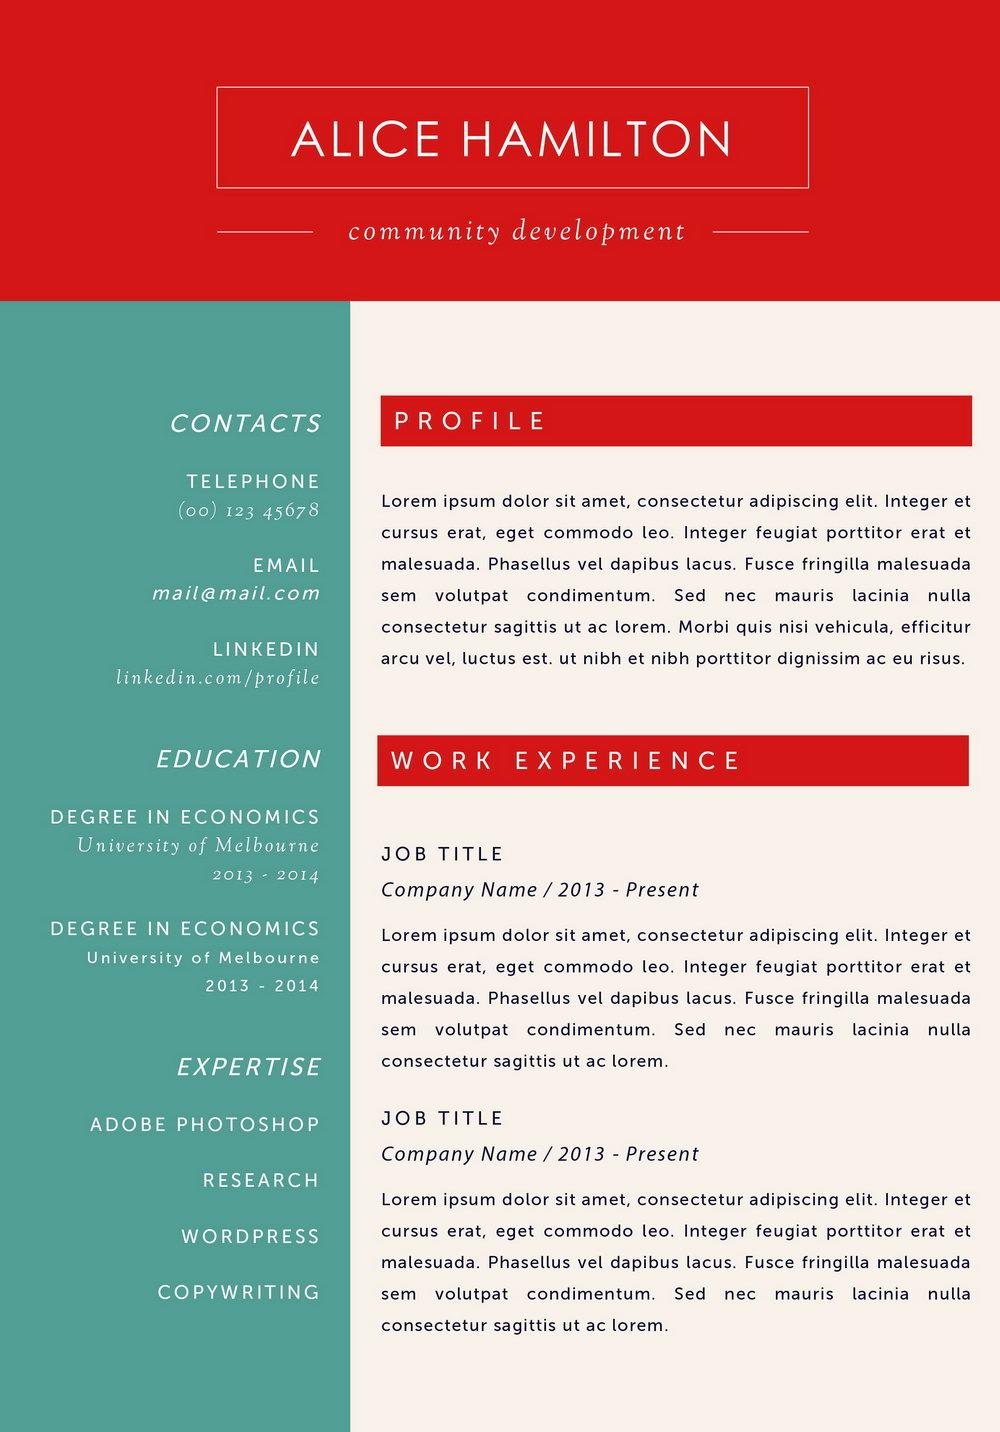 Resume Builder For Mac Free